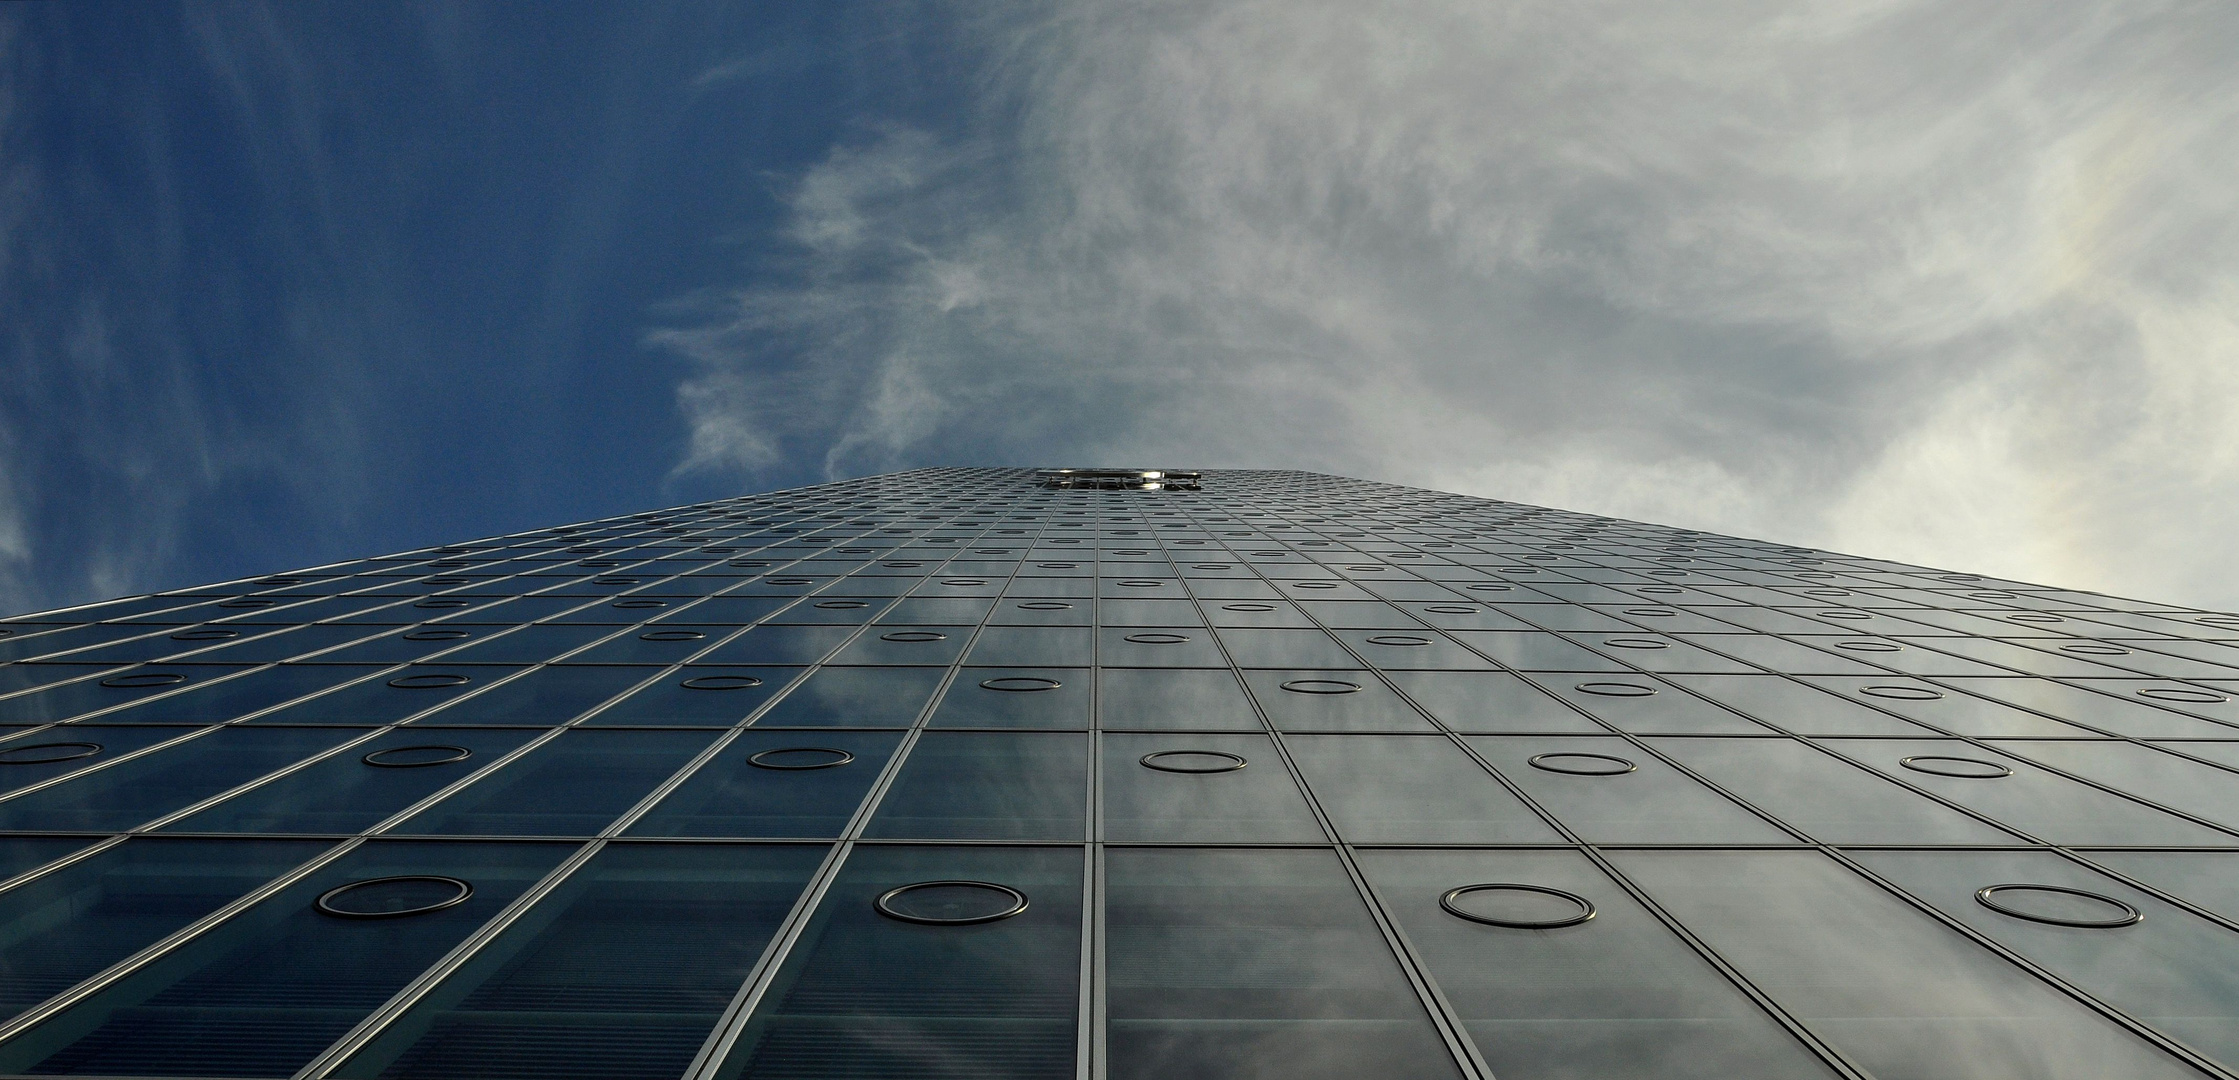 Wolkenkratzer I